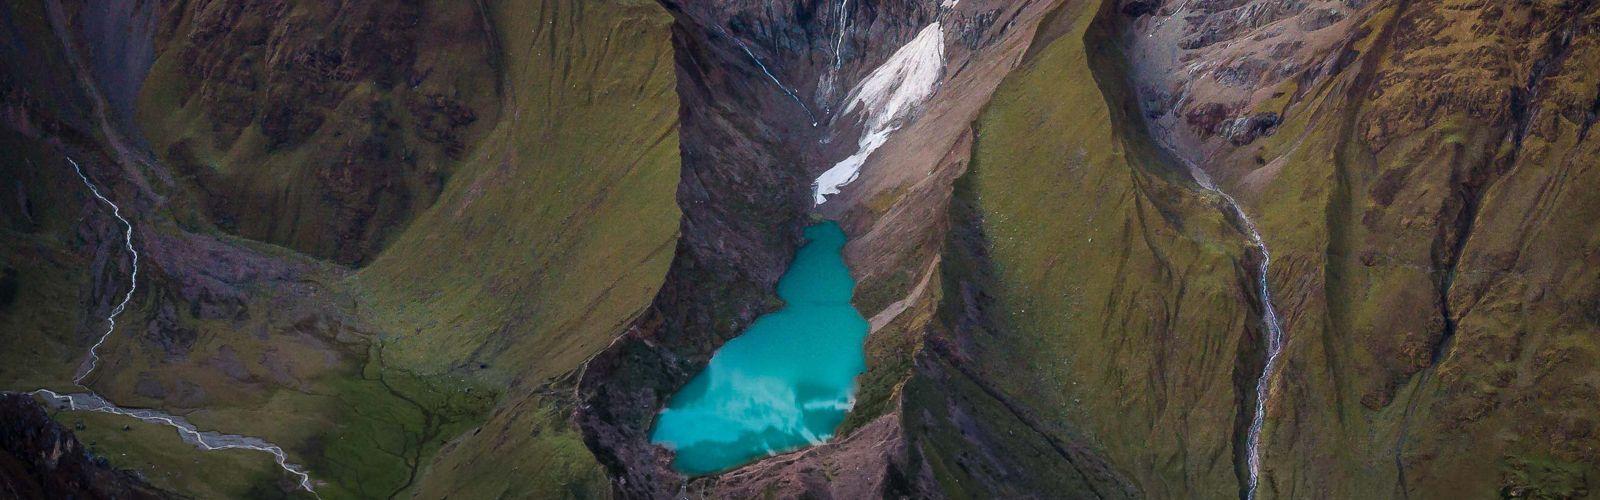 Glacier runoff from Nevado Salcantay feeding Laguna Humantay and the surrounding rivers. Taken in December 2018 near Cusco, Peru